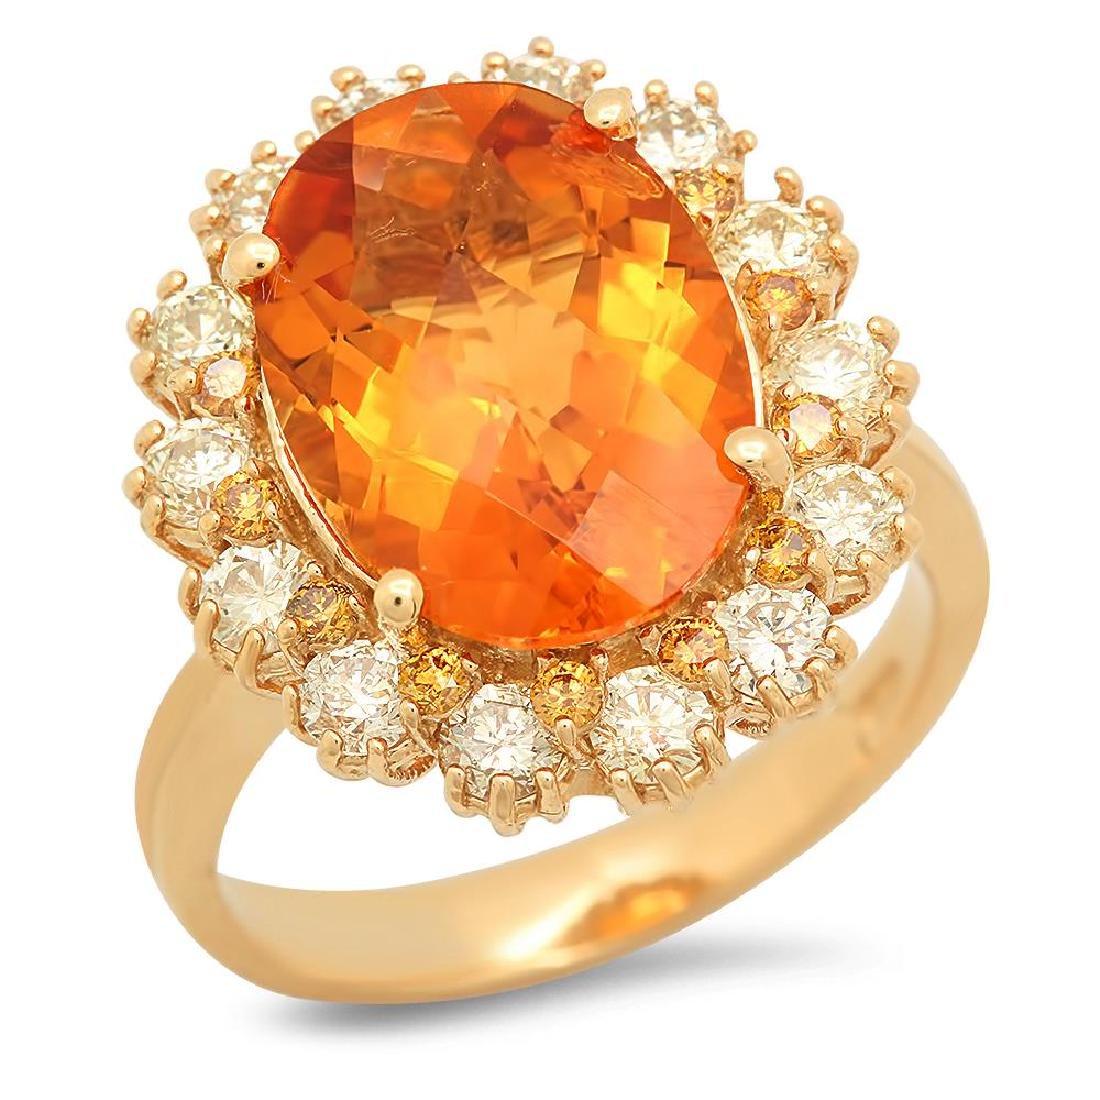 14K Gold 4.79ct Citrine 0.3ct Fancy Color Diamond